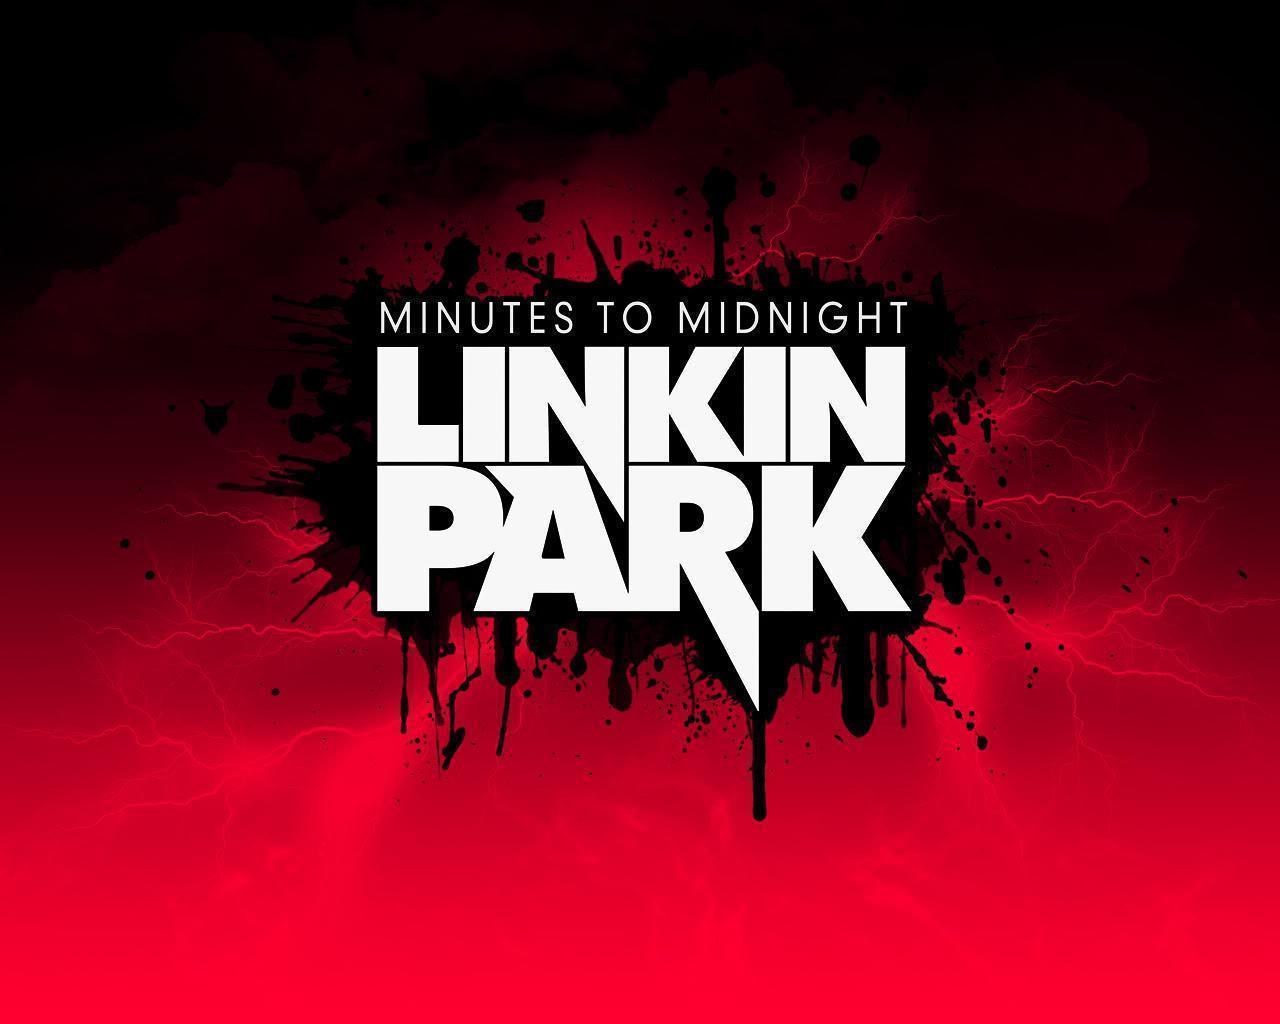 Logo game guess the brand bonus fashion doors geek - Linkin Park Logo 2017 Wallpapers Wallpaper Cave